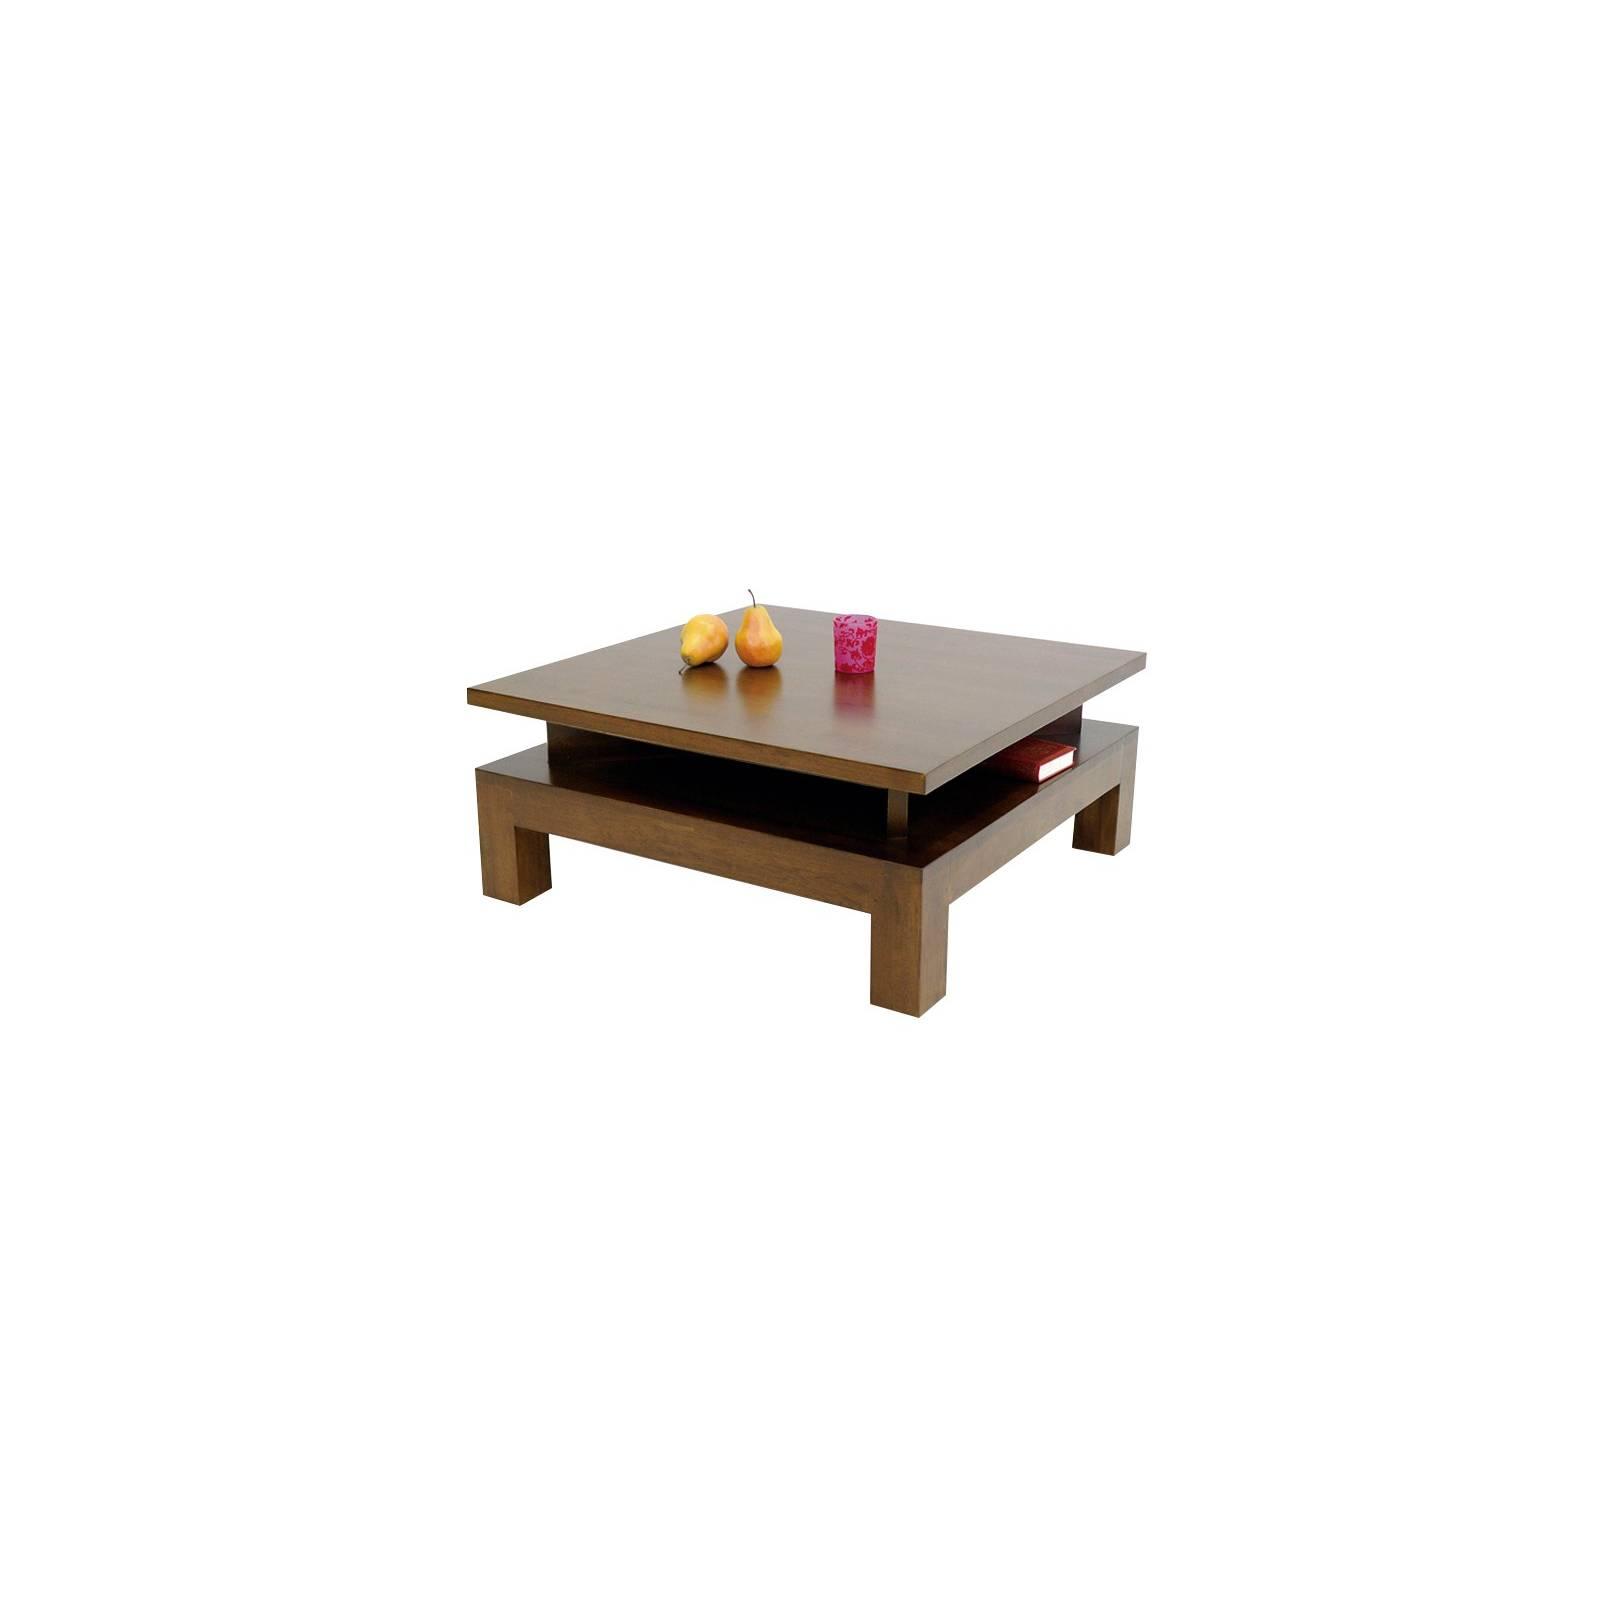 Table Basse Surélevée Omega Hévéa - meuble style design